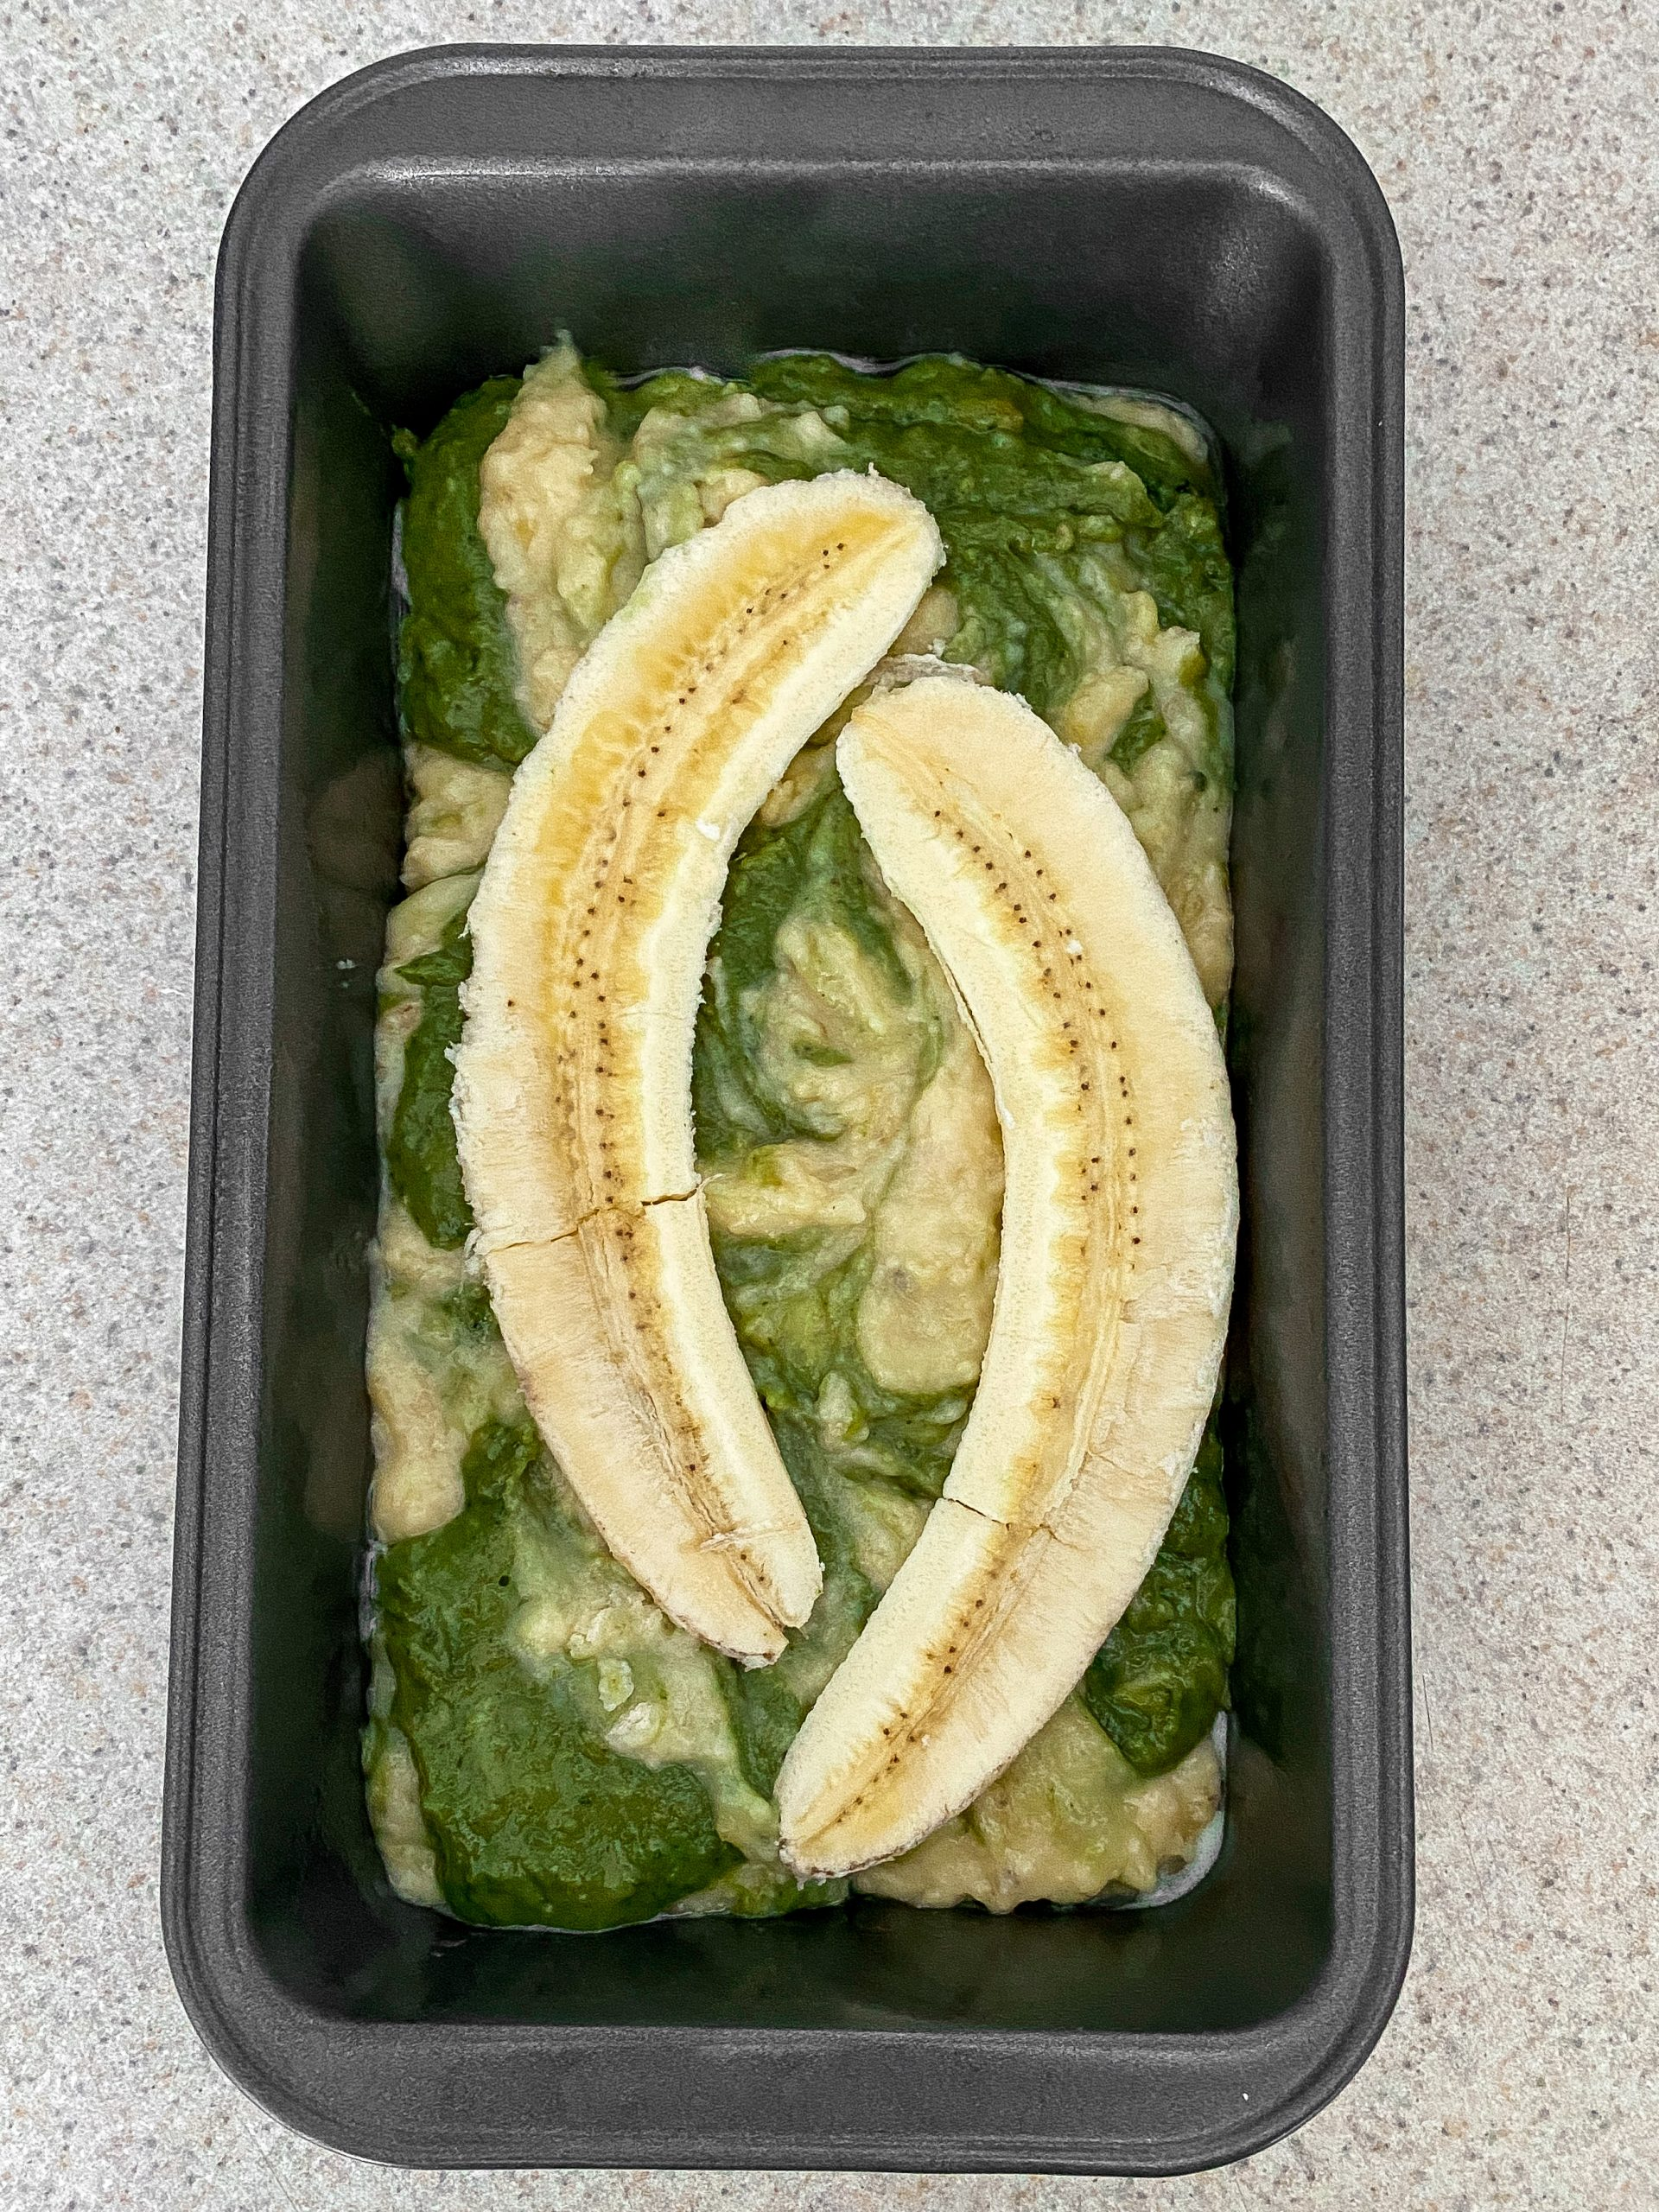 A pre-baking look at the swirled matcha banana bread.